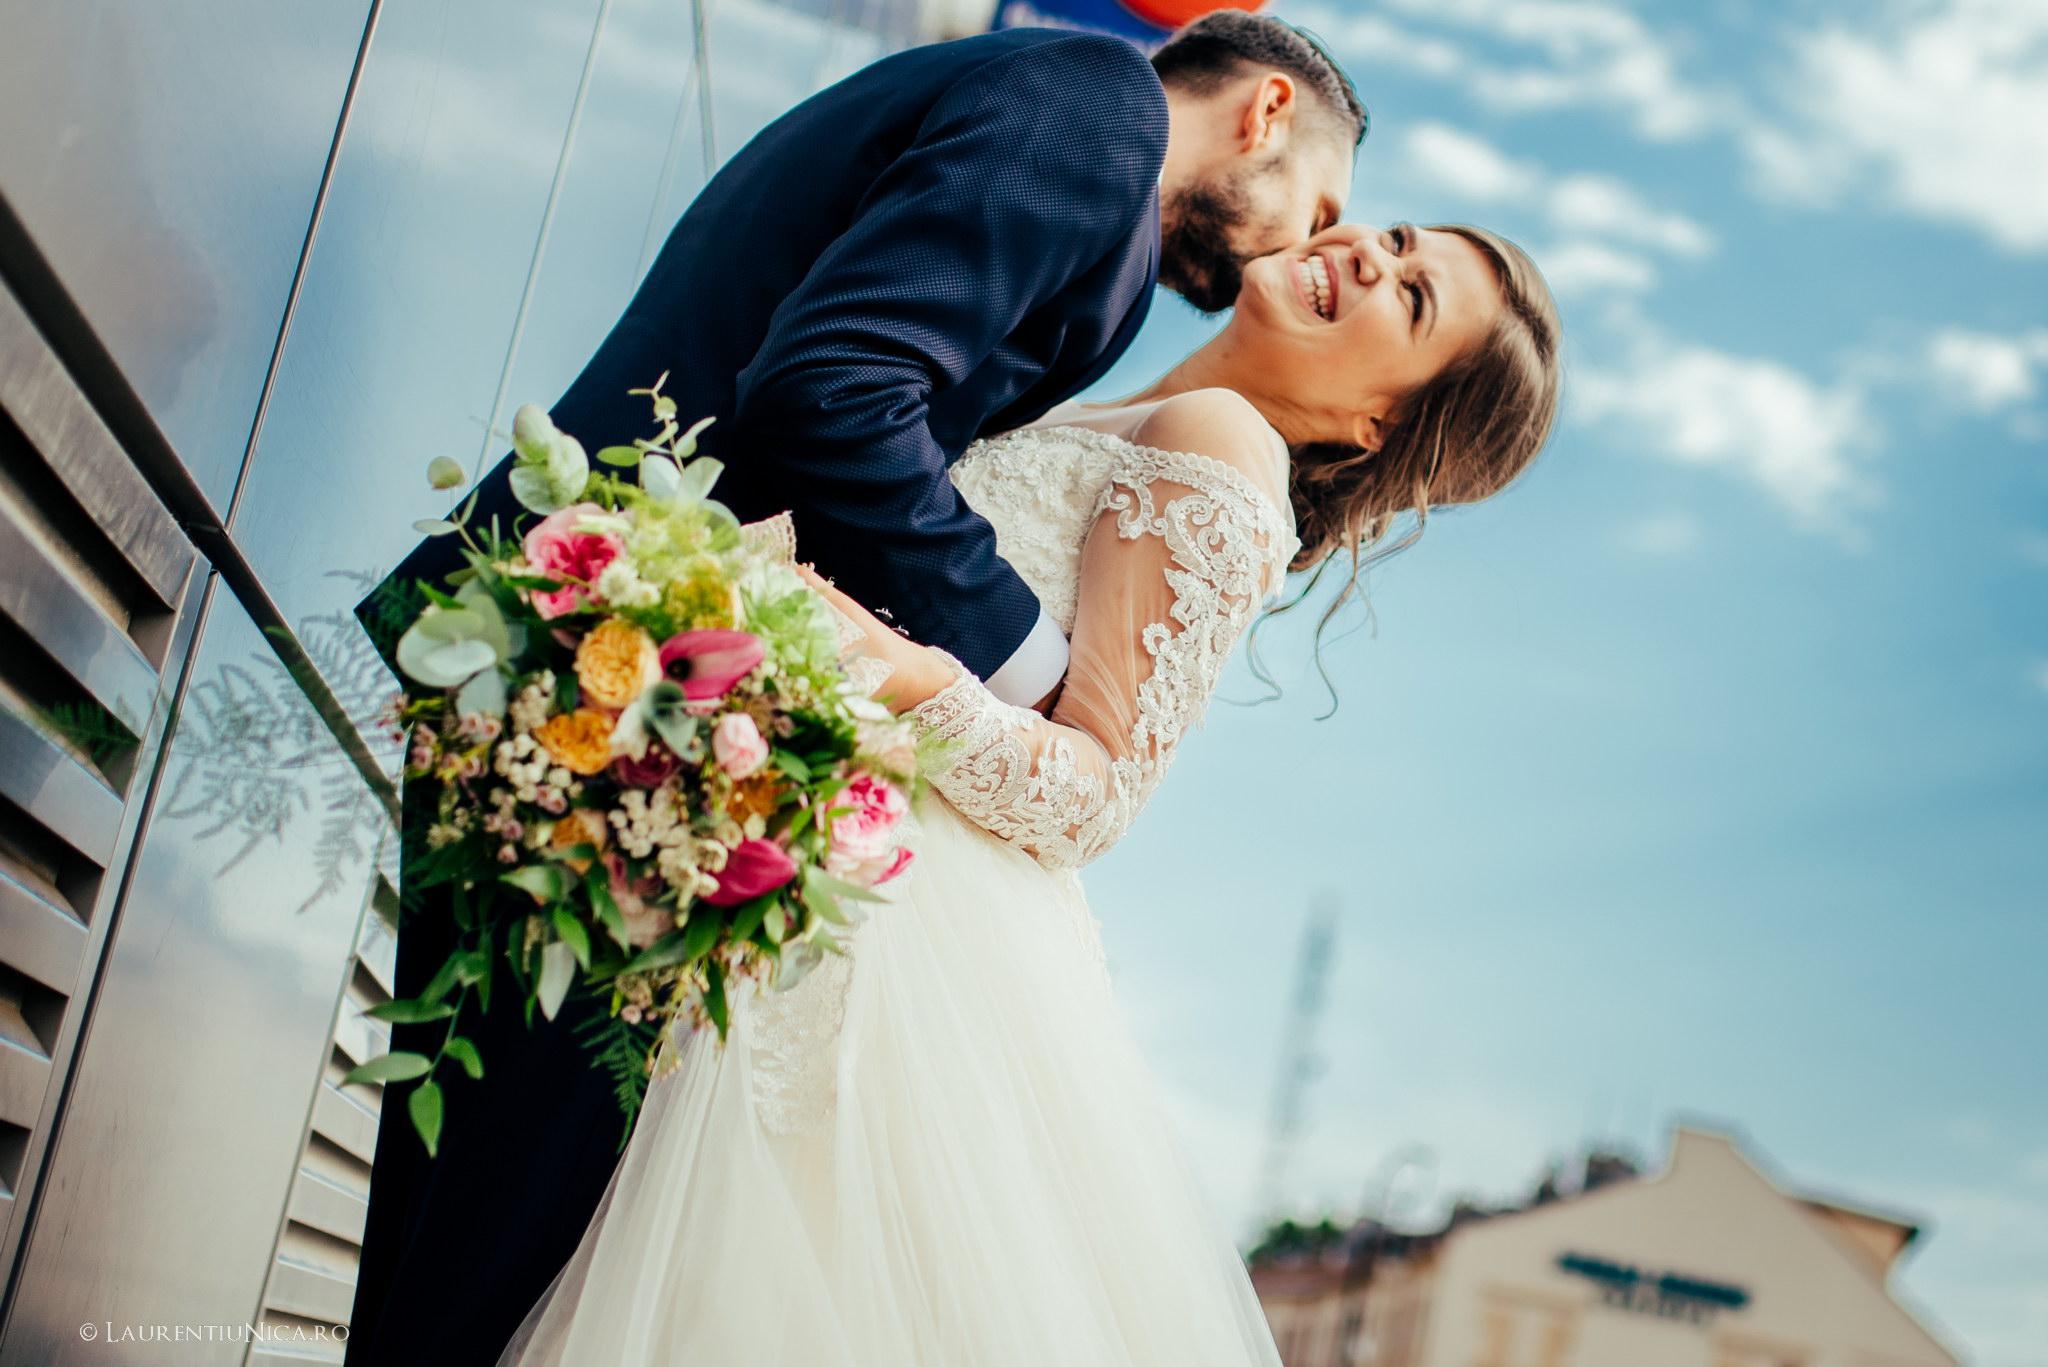 Alina si Andrei fotograf nunta laurentiu nica craiova 42 - Alina & Andrei | Fotografii nunta